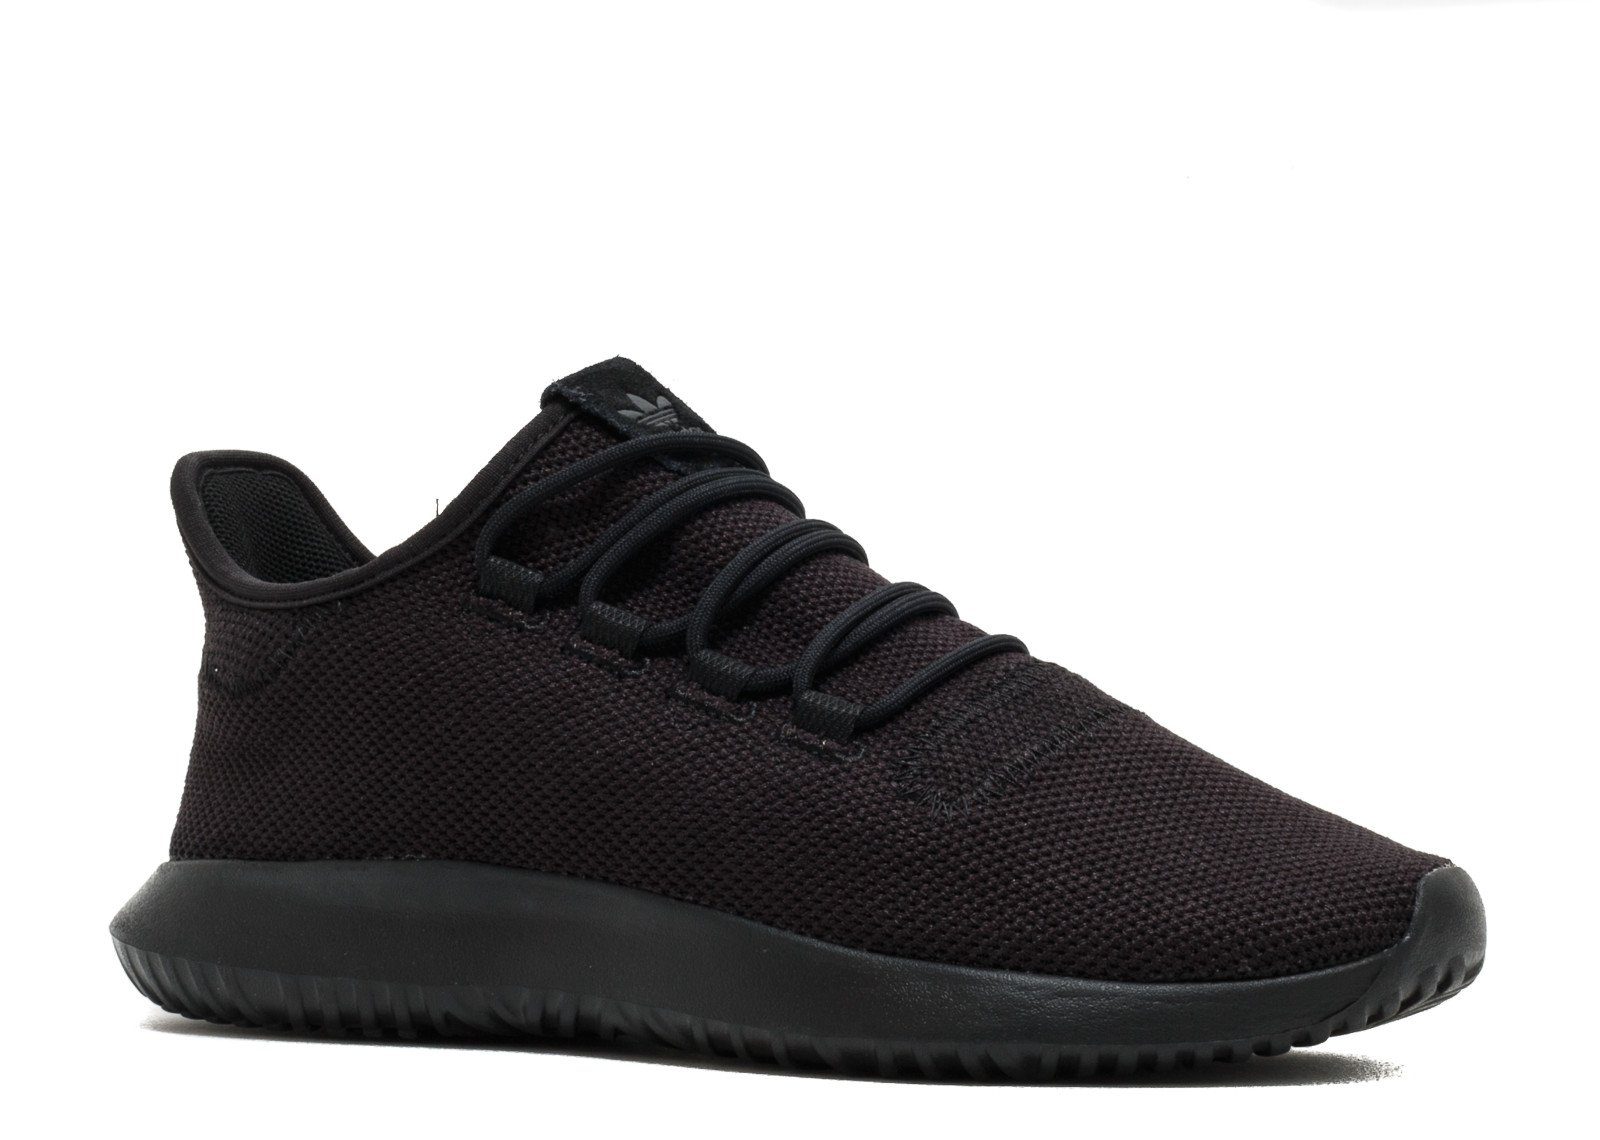 716y5X5jdcL - Adidas Tubular Shadow Tennis Shoe Men